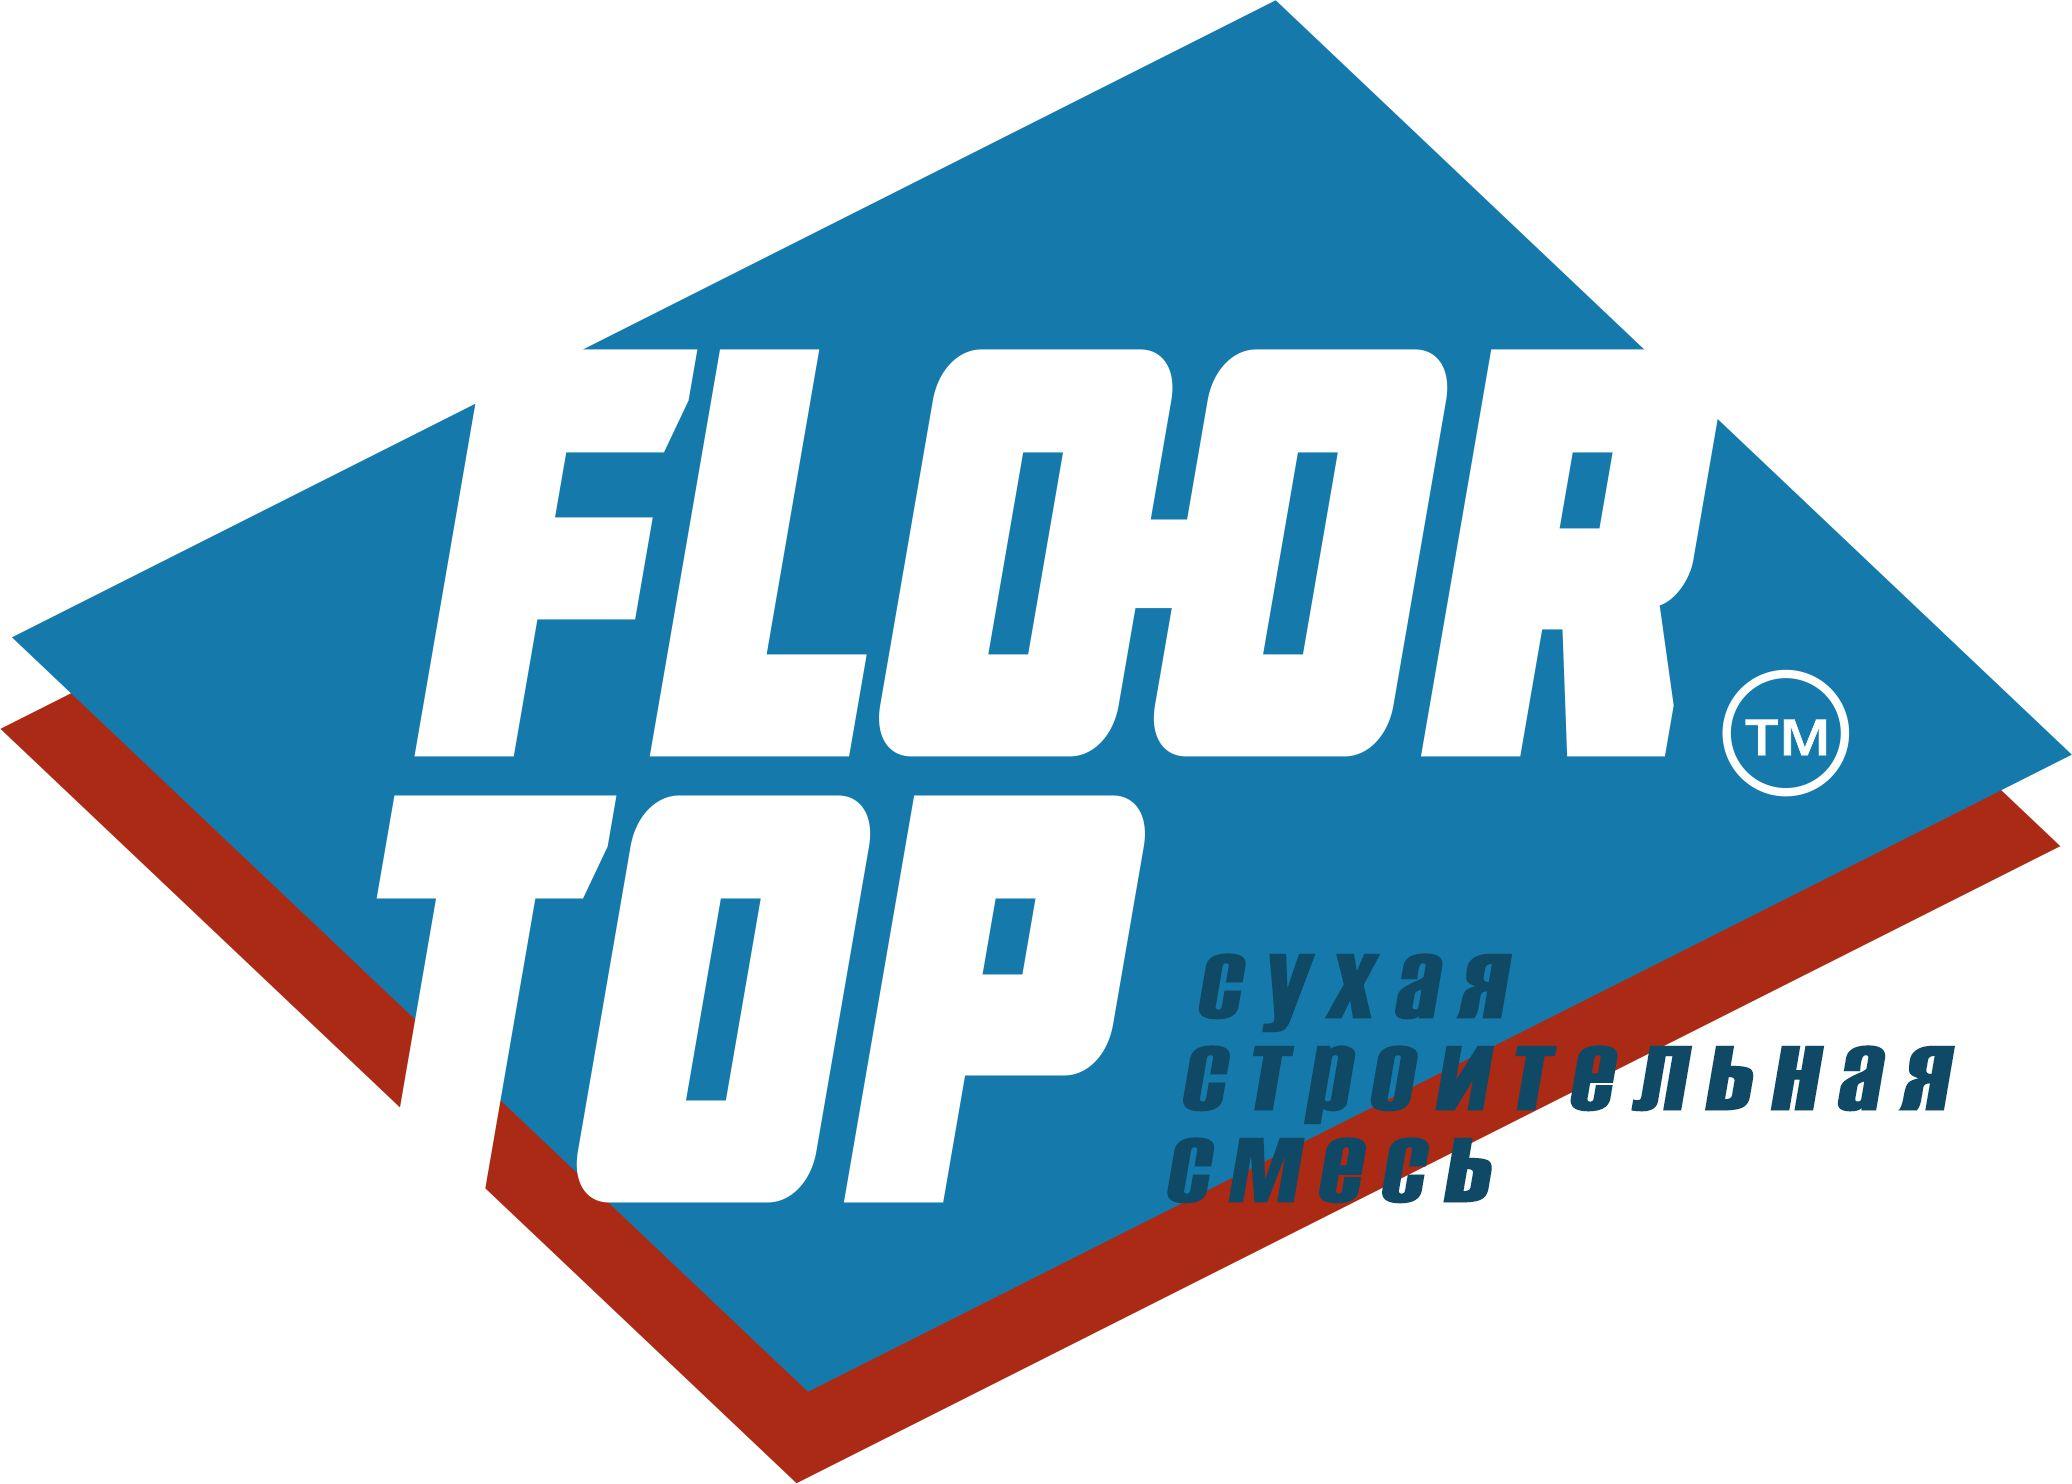 Разработка логотипа и дизайна на упаковку для сухой смеси фото f_0935d2b6cf08e6ed.jpg